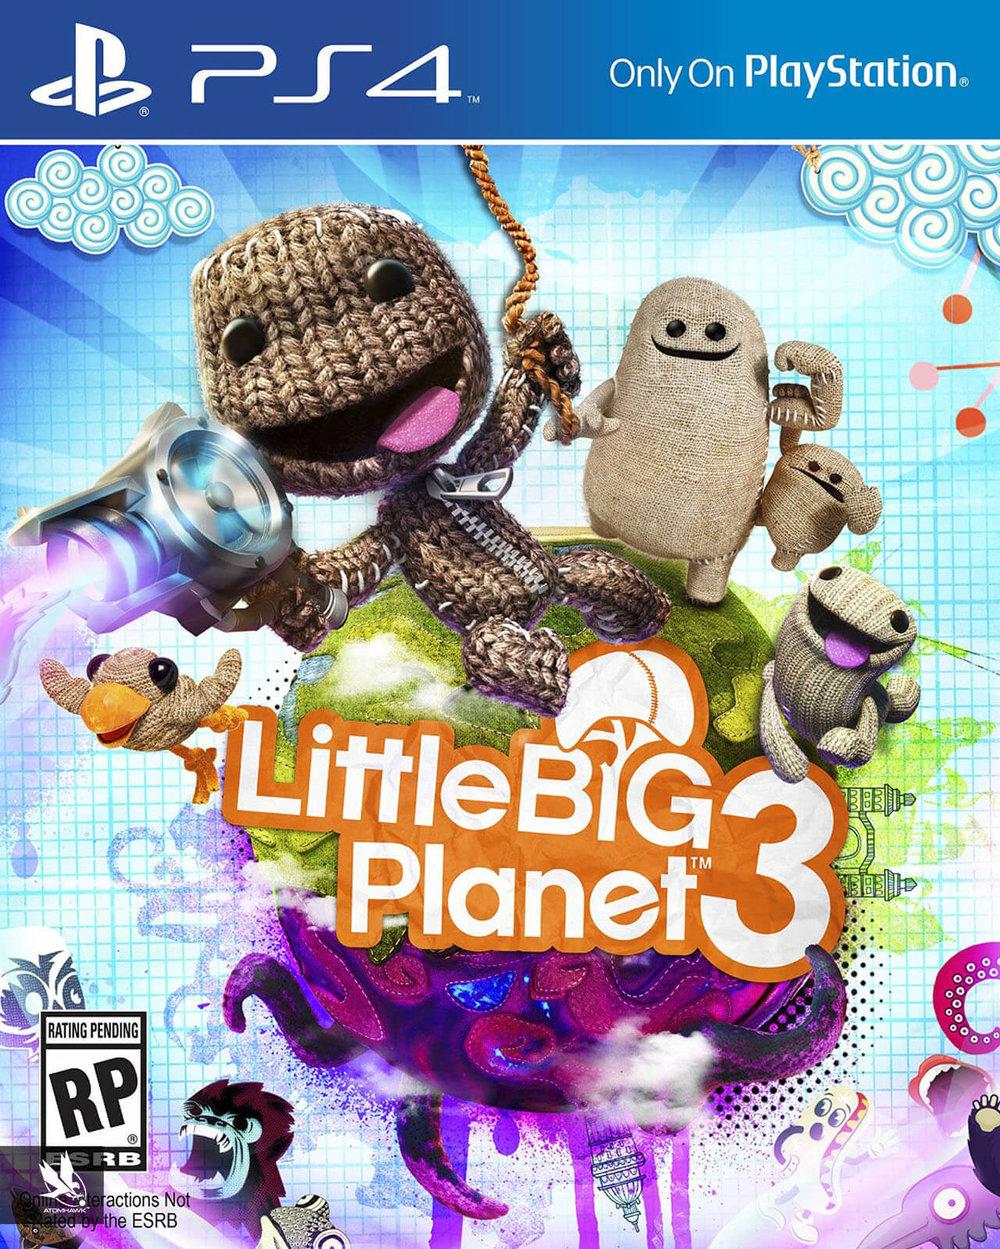 Atomhawk_Sony_Little Big Planet 3_Marketing Art_Box Art_Services.jpg